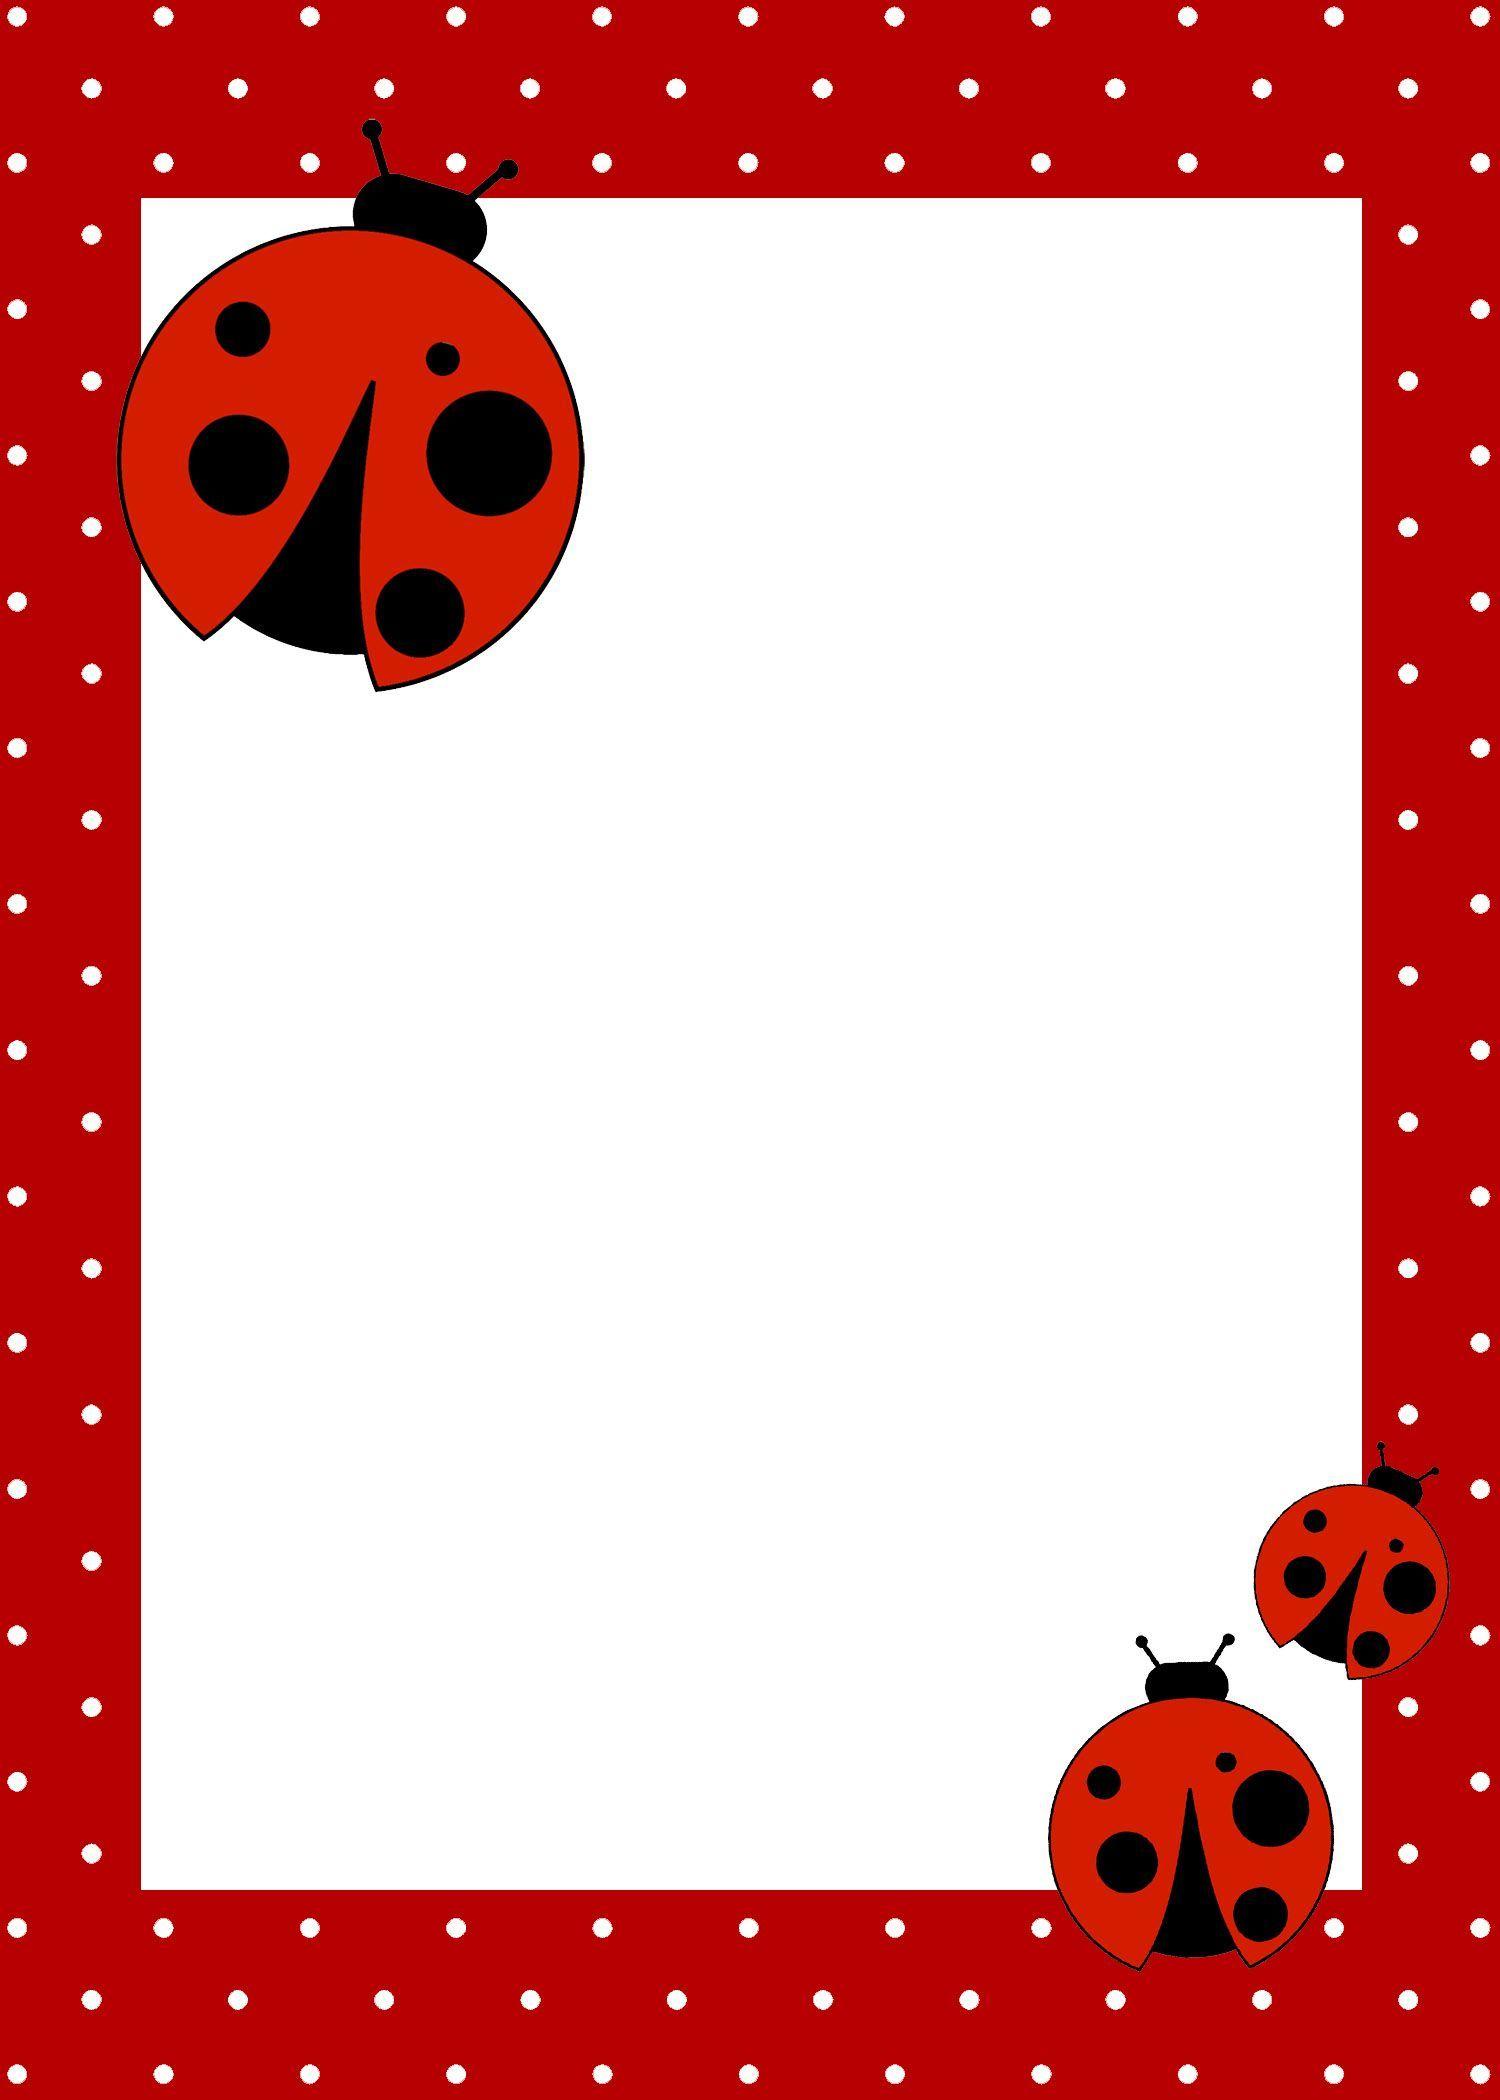 Free Printables ~ Ladybug Birthday Invitation, Garland, Cupcake - Free Printable Ladybug Invitations